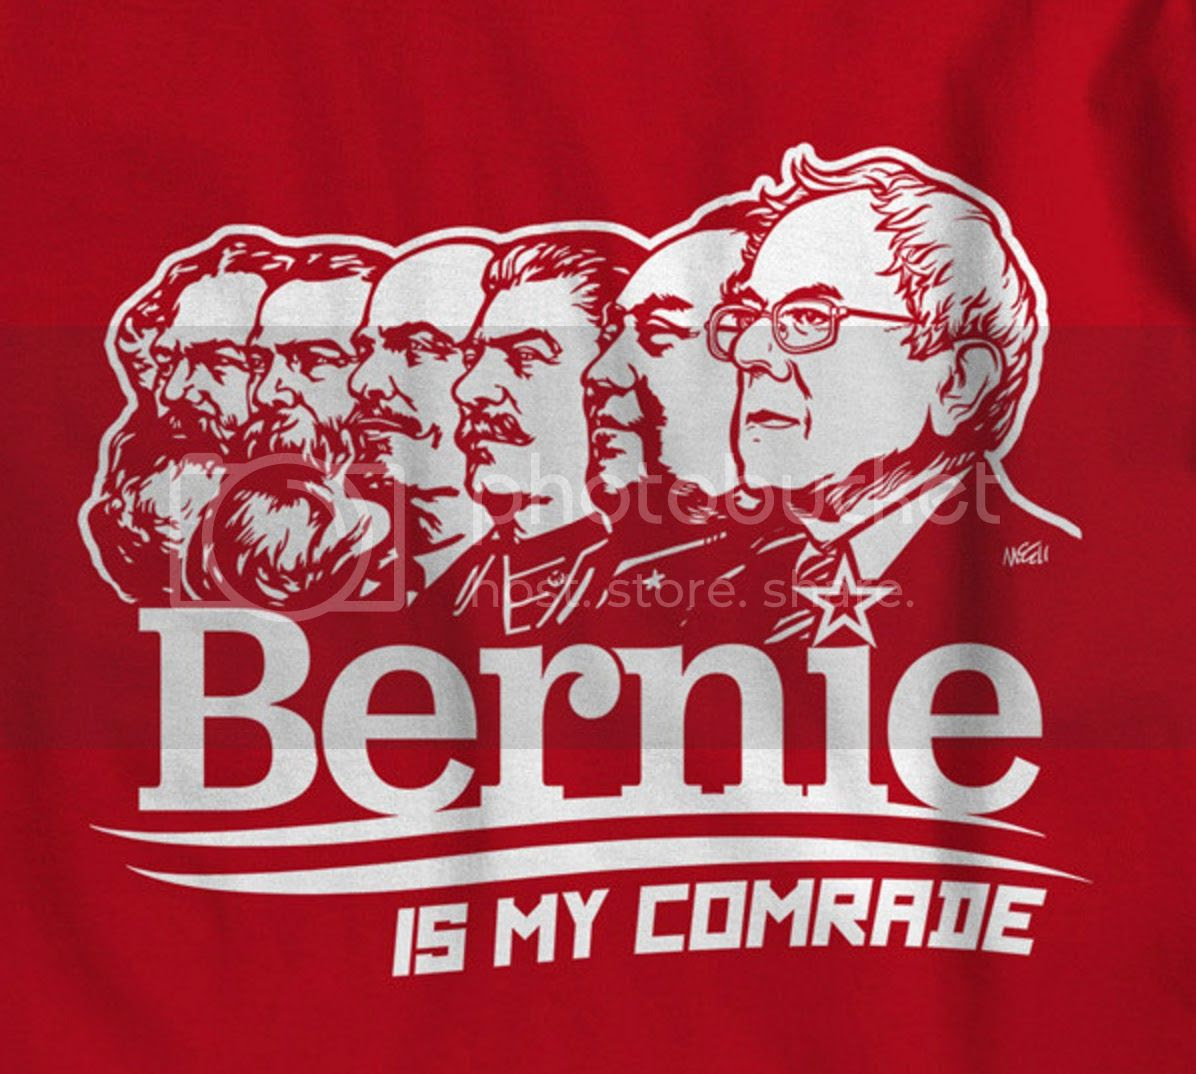 'Bernie Is My Comrade' photo comrade_zpslbs5ajvx.jpg